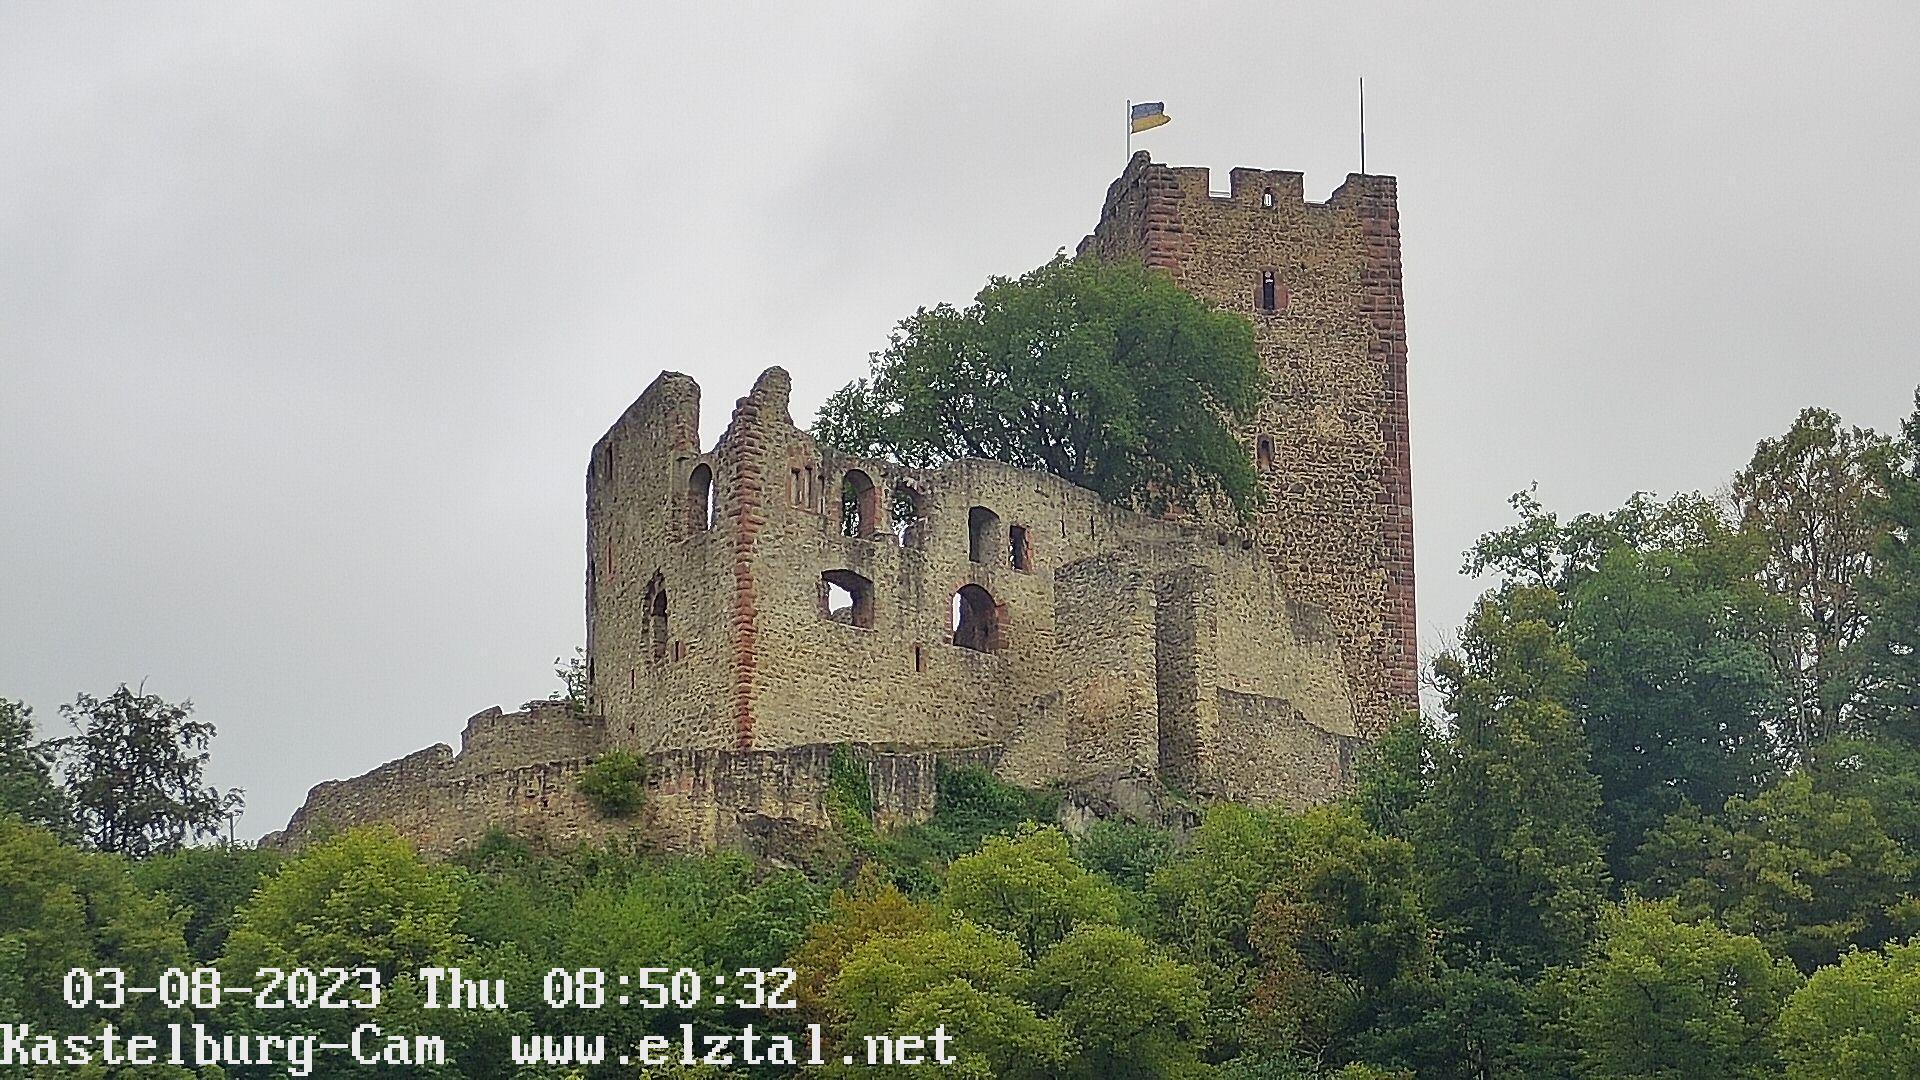 Waldkirch Wed. 08:55